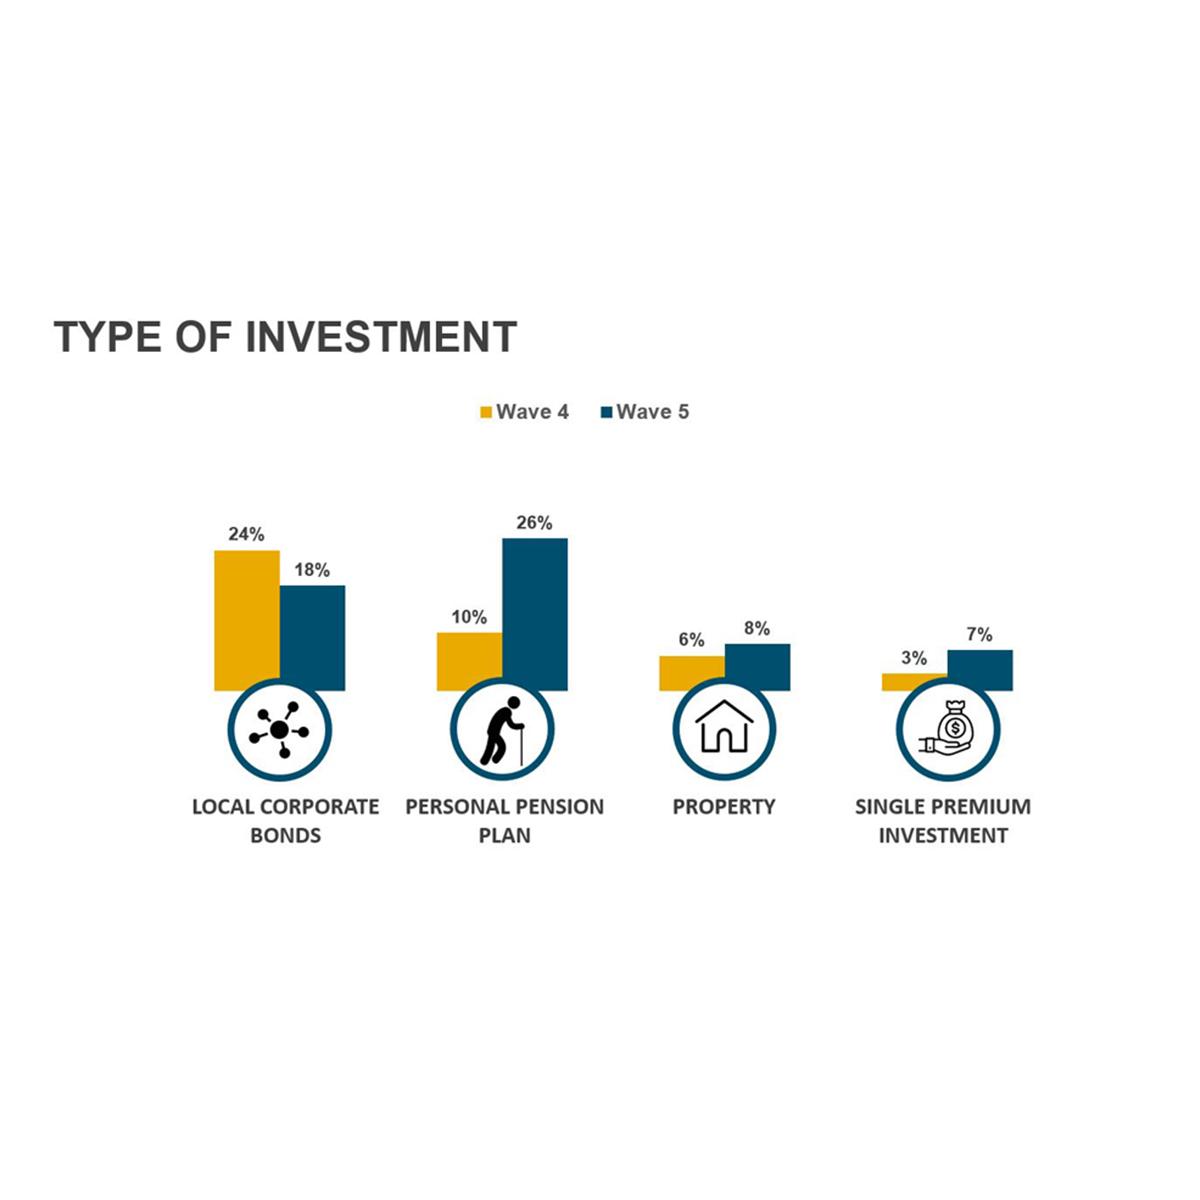 Generational Change driving Investor Sentiment